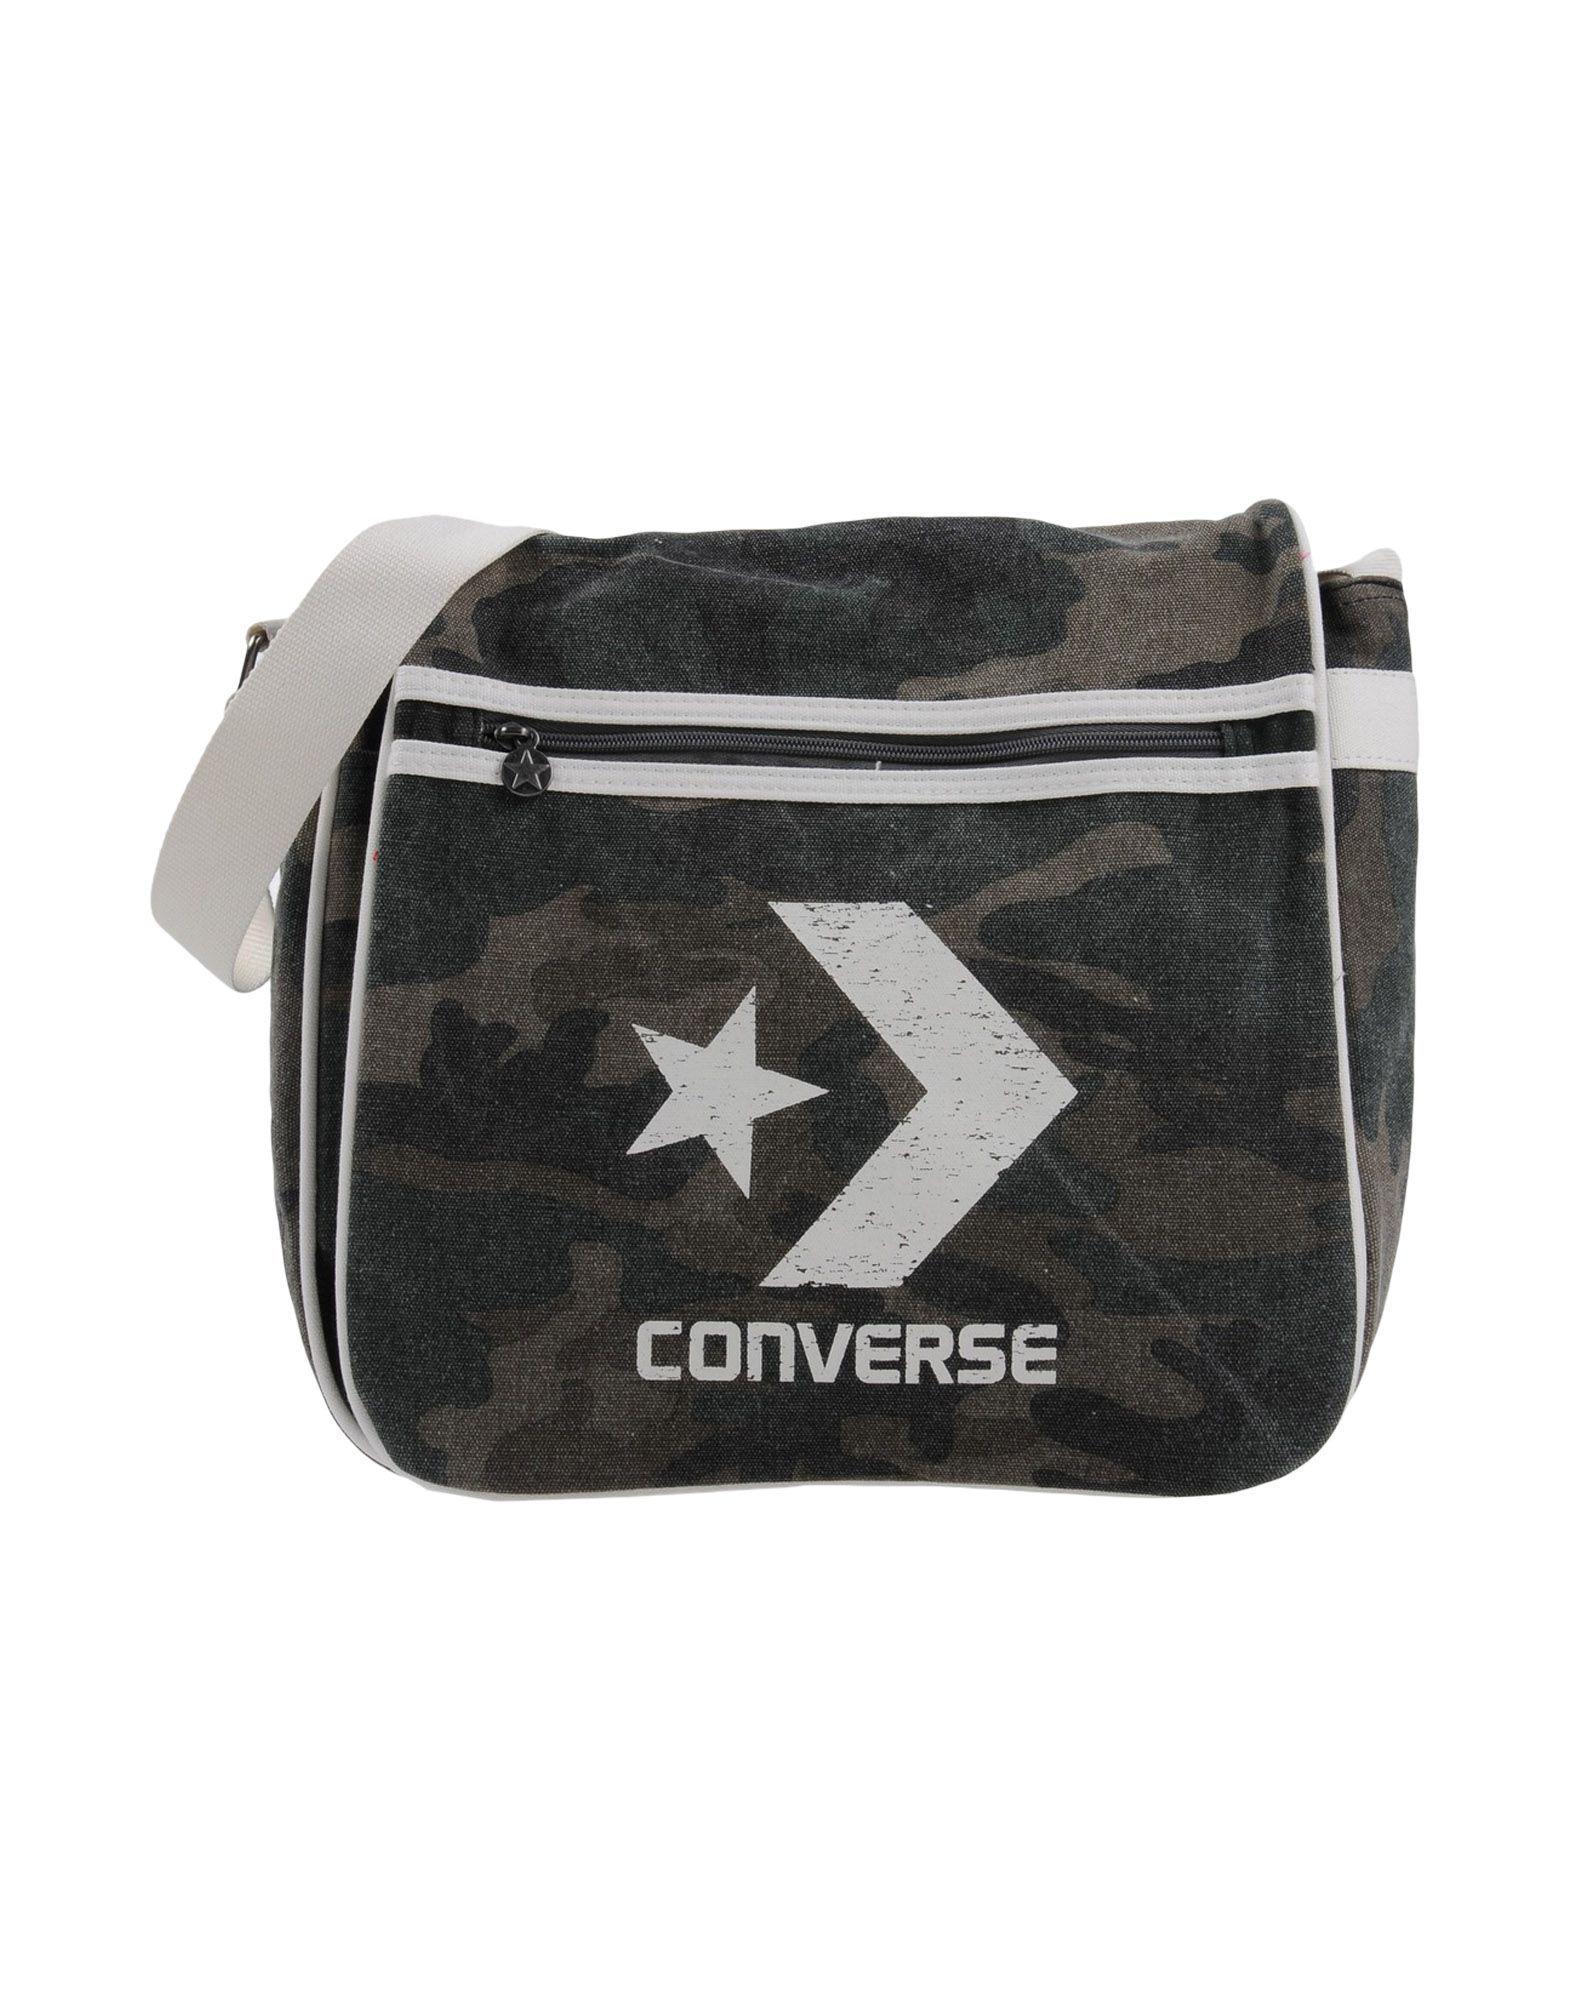 364c1d0bb97 CONVERSE HANDBAGS.  converse  bags  shoulder bags  canvas  cotton ...